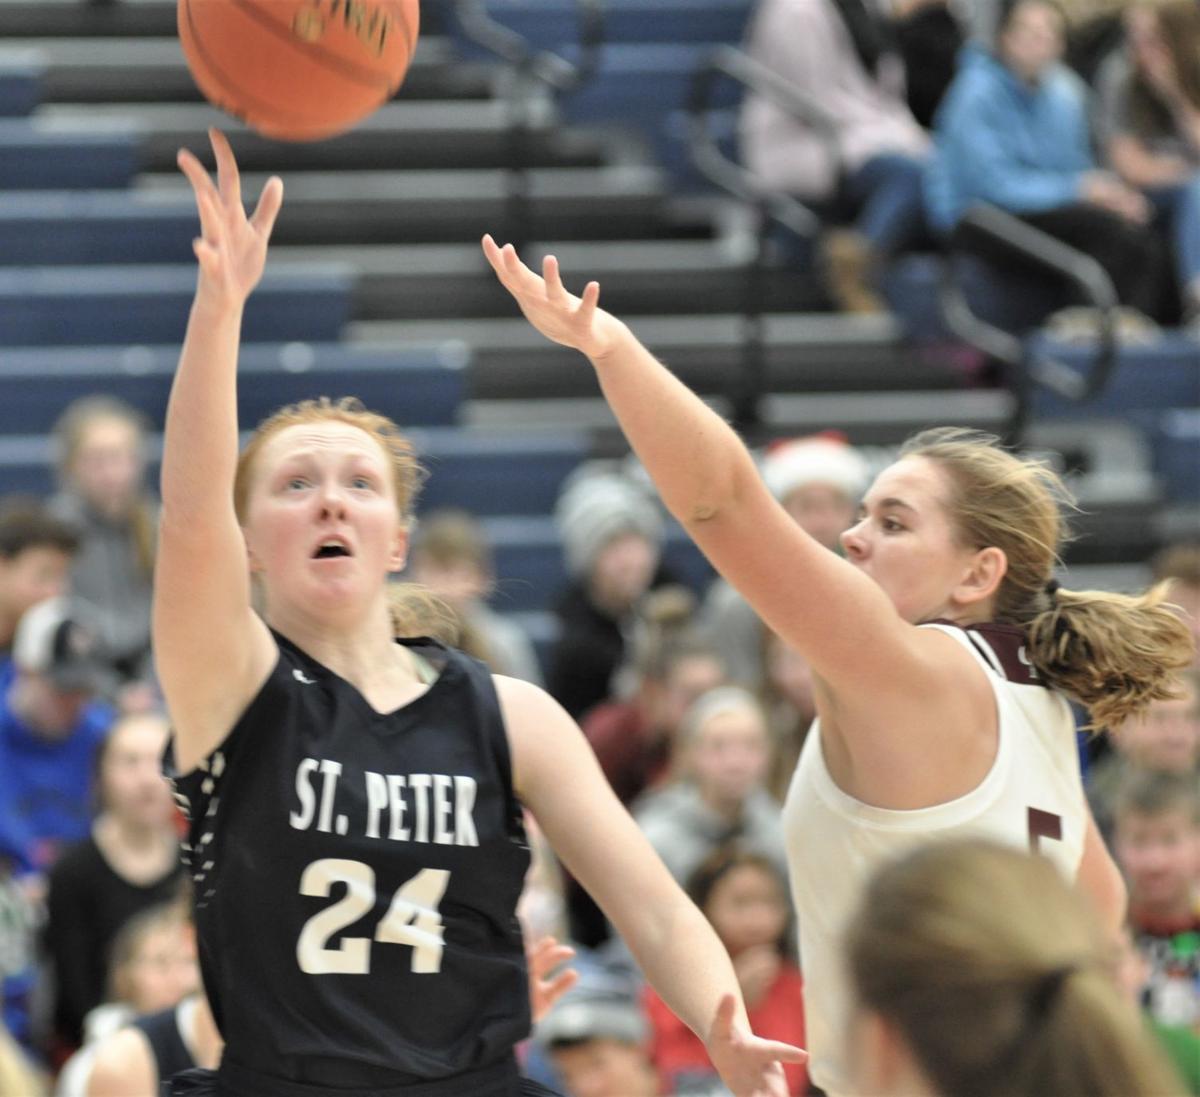 St. Peter depth wears down NYA, Saints girls win